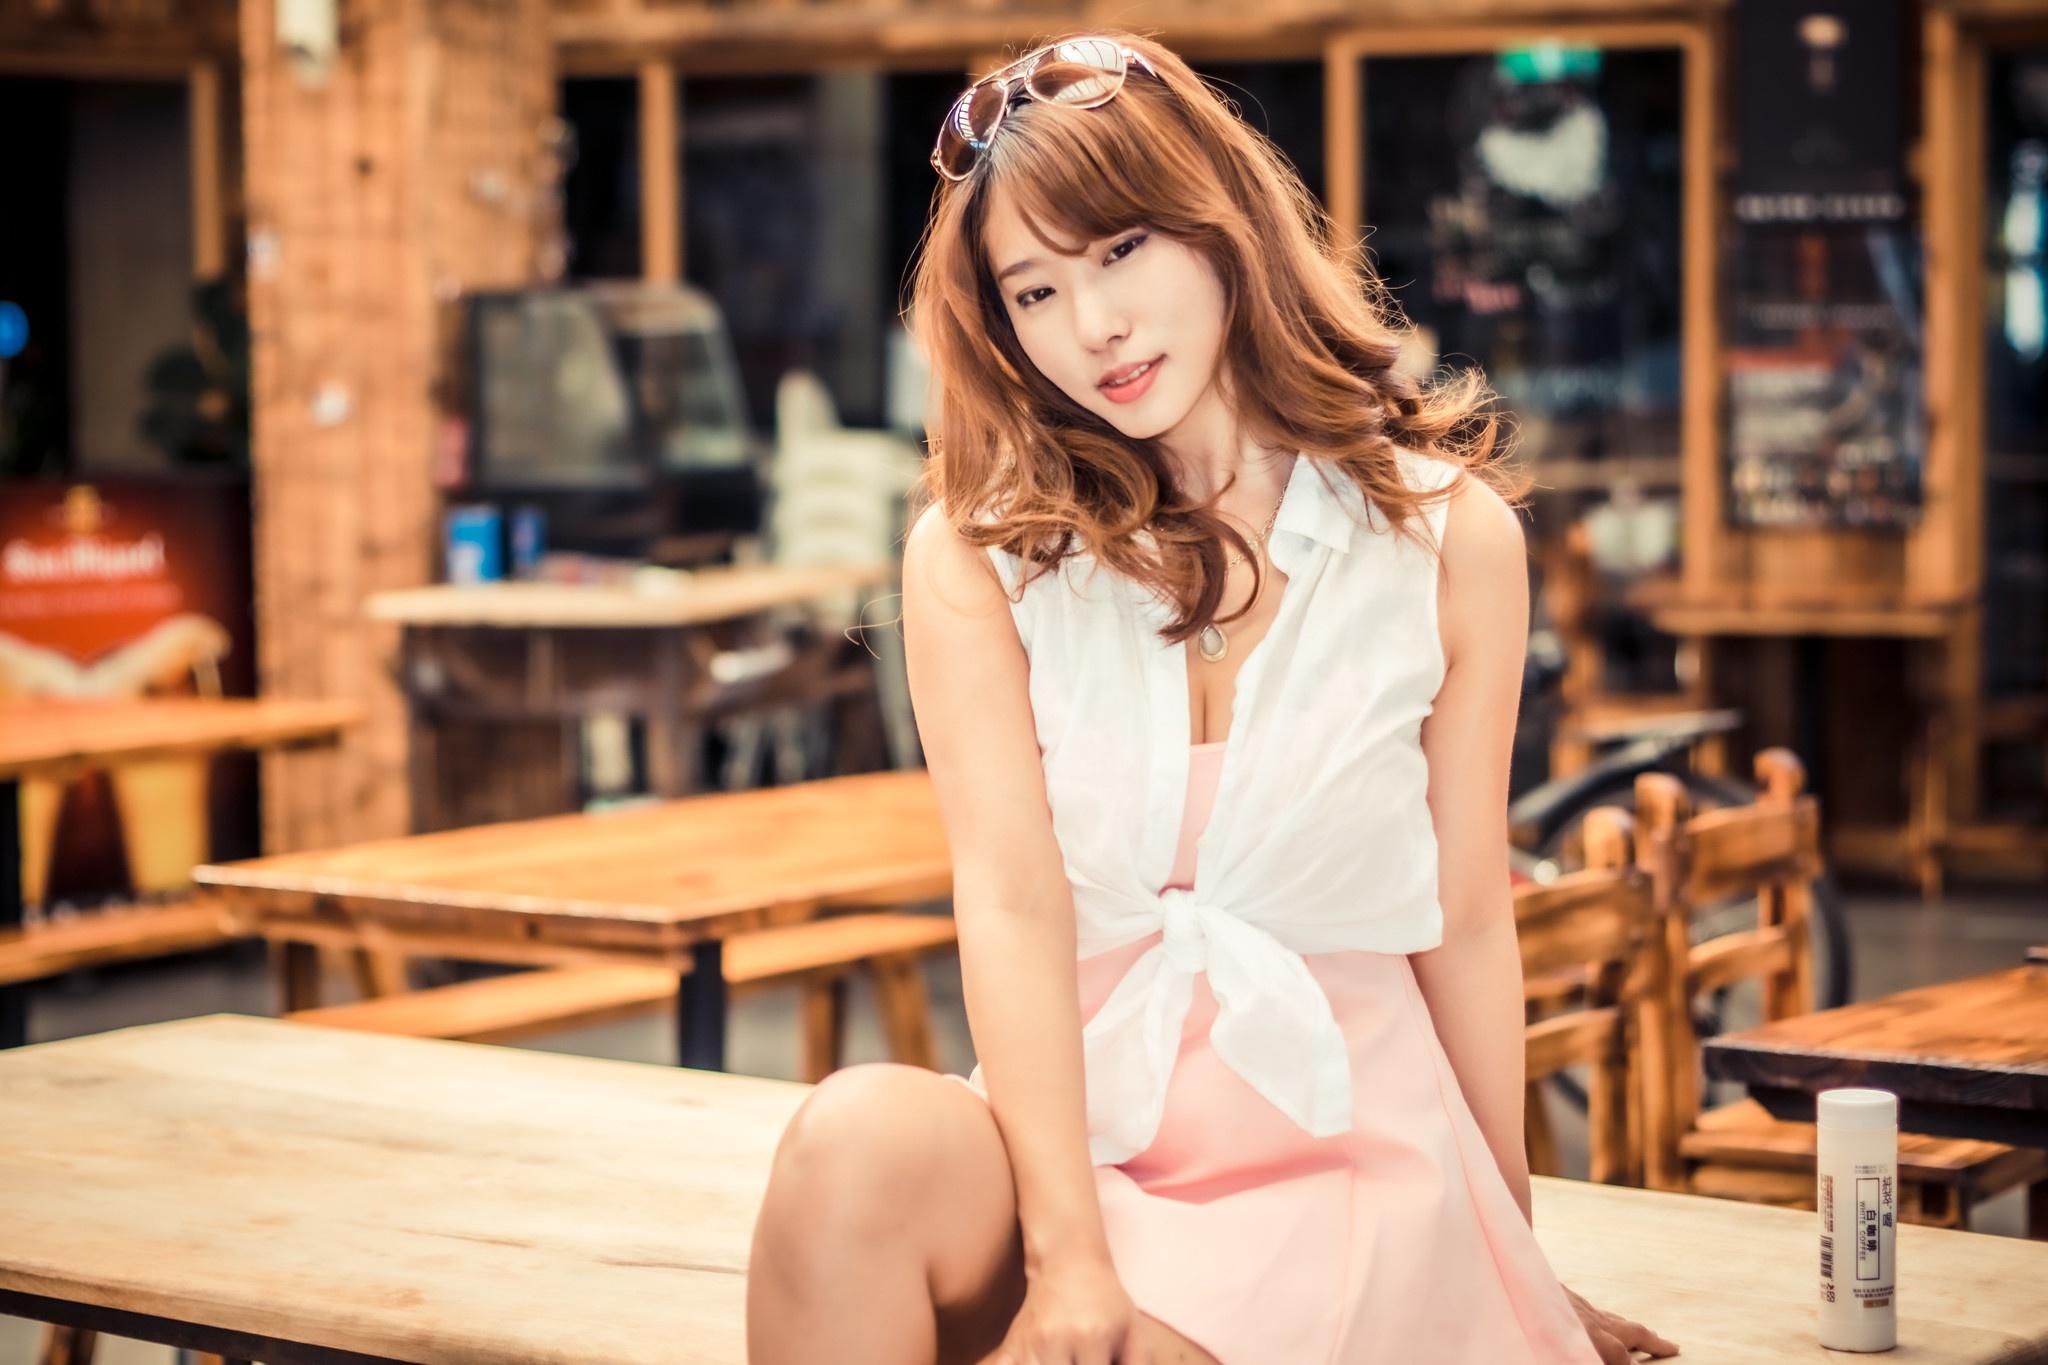 Asian Girl Model Redhead Woman 2048x1365